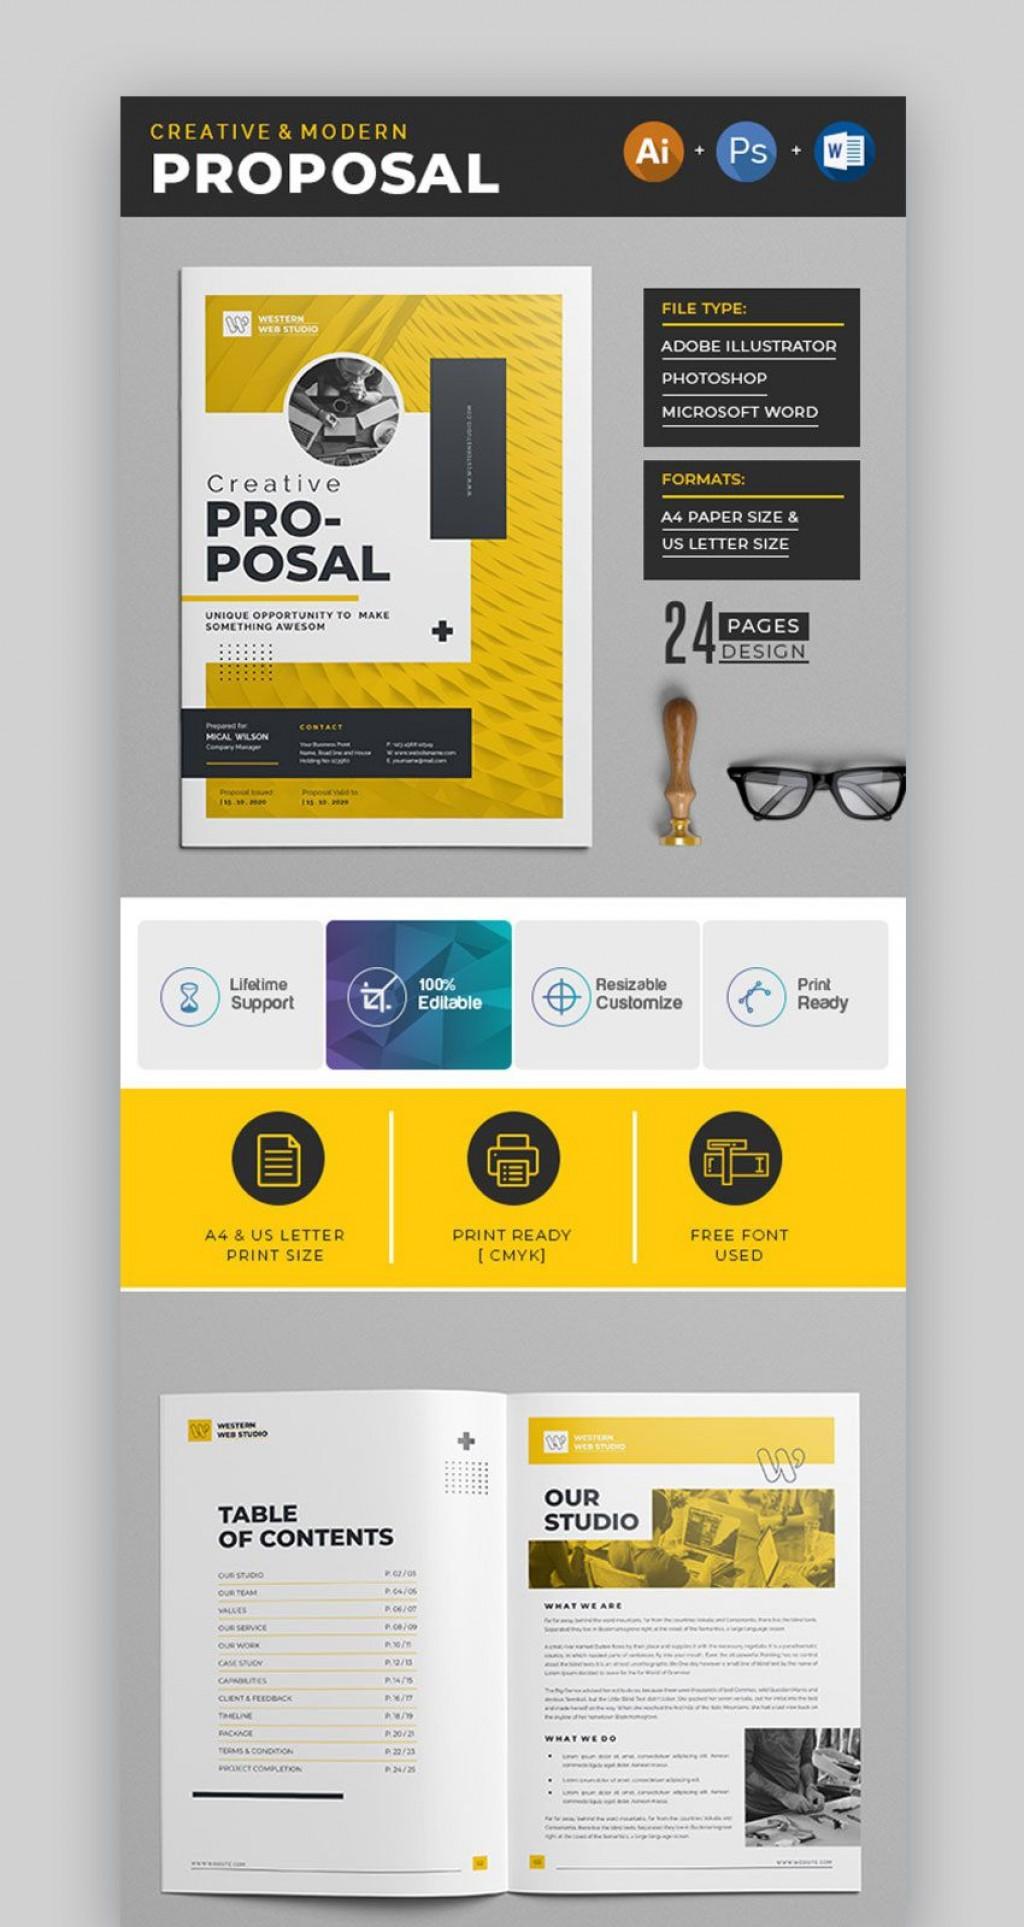 009 Astounding Web Design Proposal Template Free Highest Quality  Freelance DownloadLarge